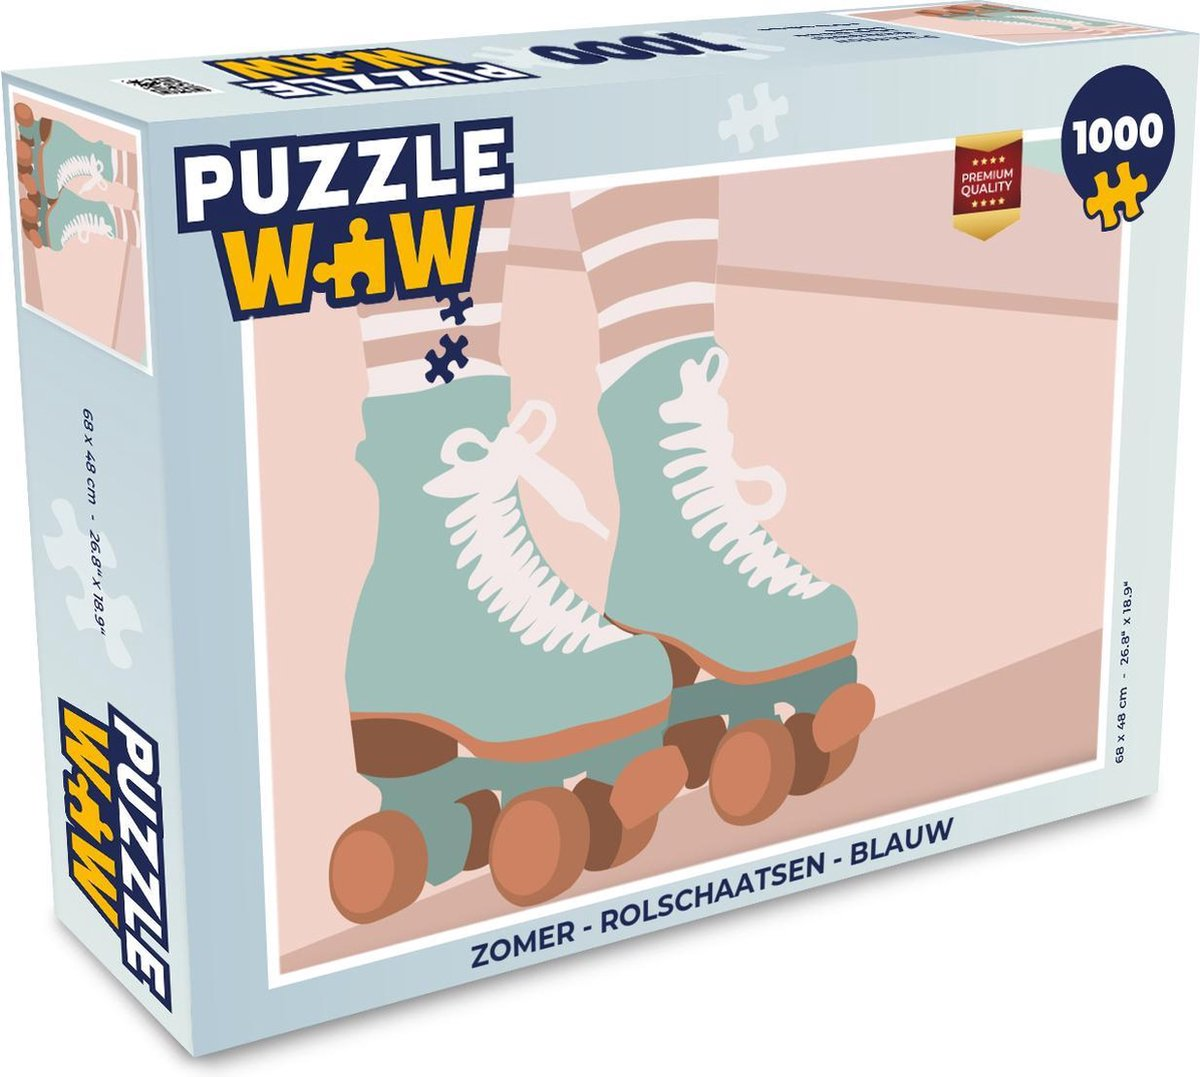 Puzzel Zomer - Rolschaatsen - Blauw - Legpuzzel - Puzzel 1000 stukjes volwassenen